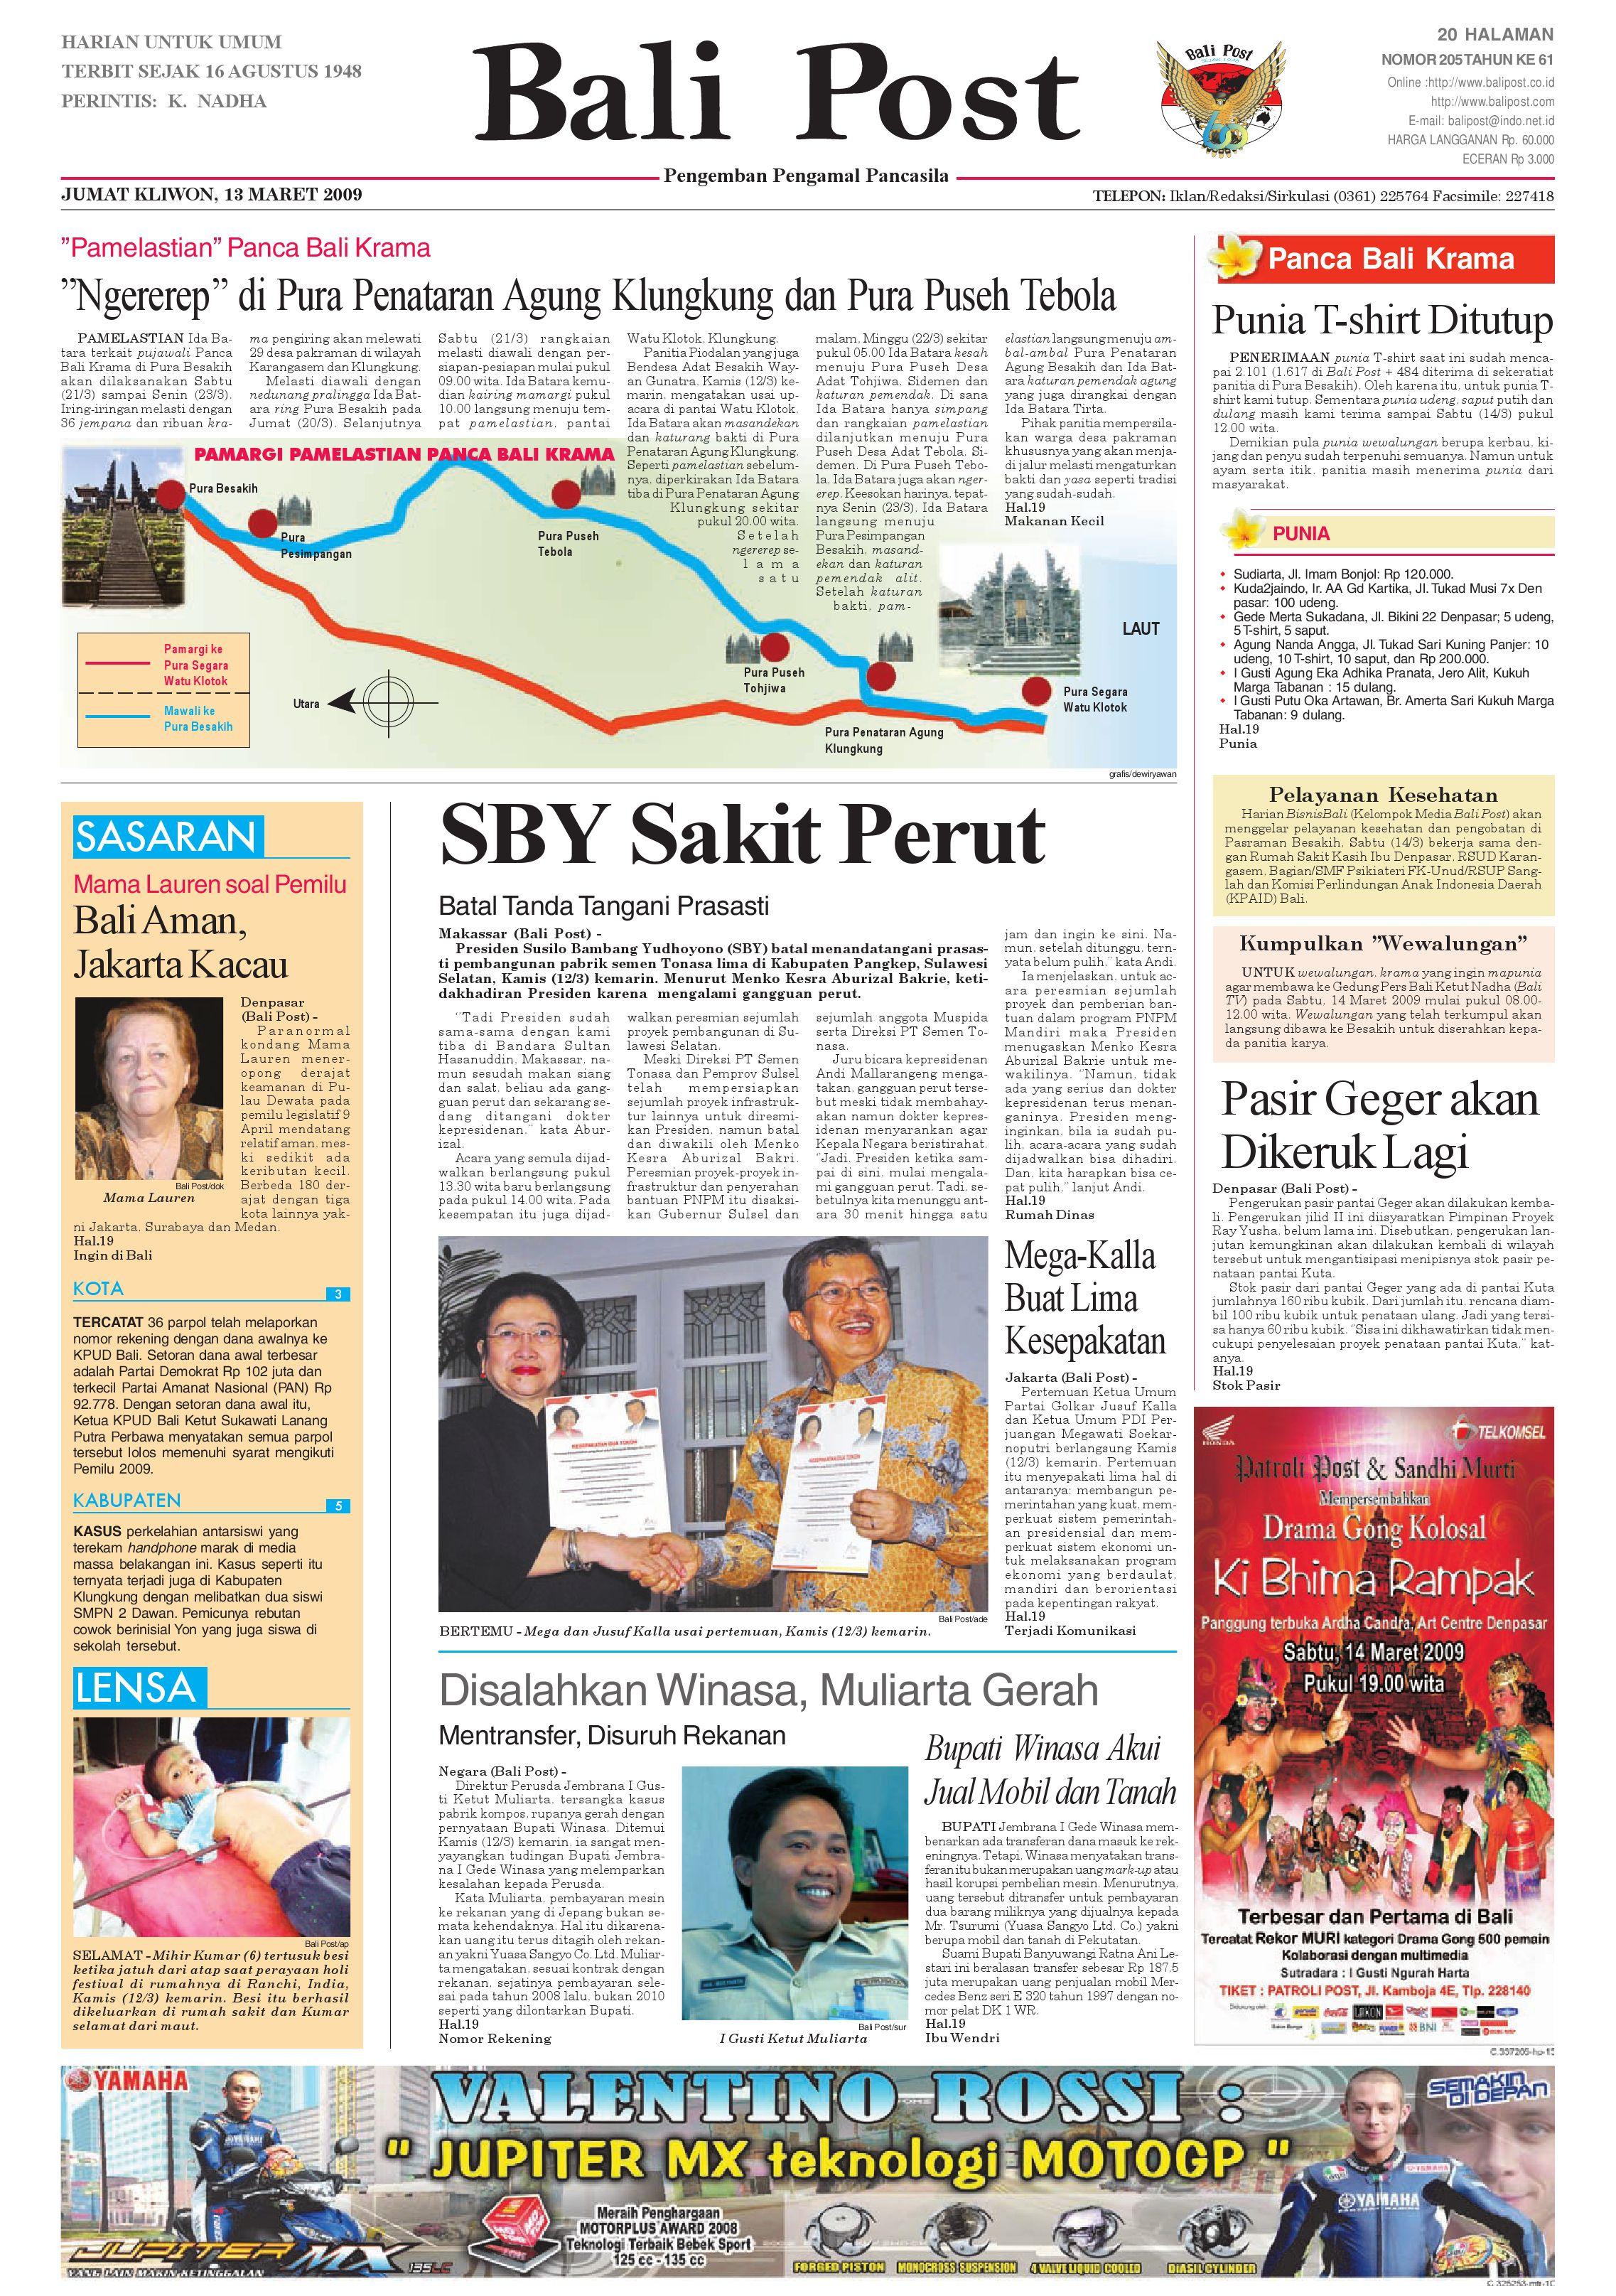 Bali Post Jumat 13 Maret 2009 By E Paper Kmb Issuu Voucher 300 Plus Tiara Gatzu Monang Maning Toko Soputan